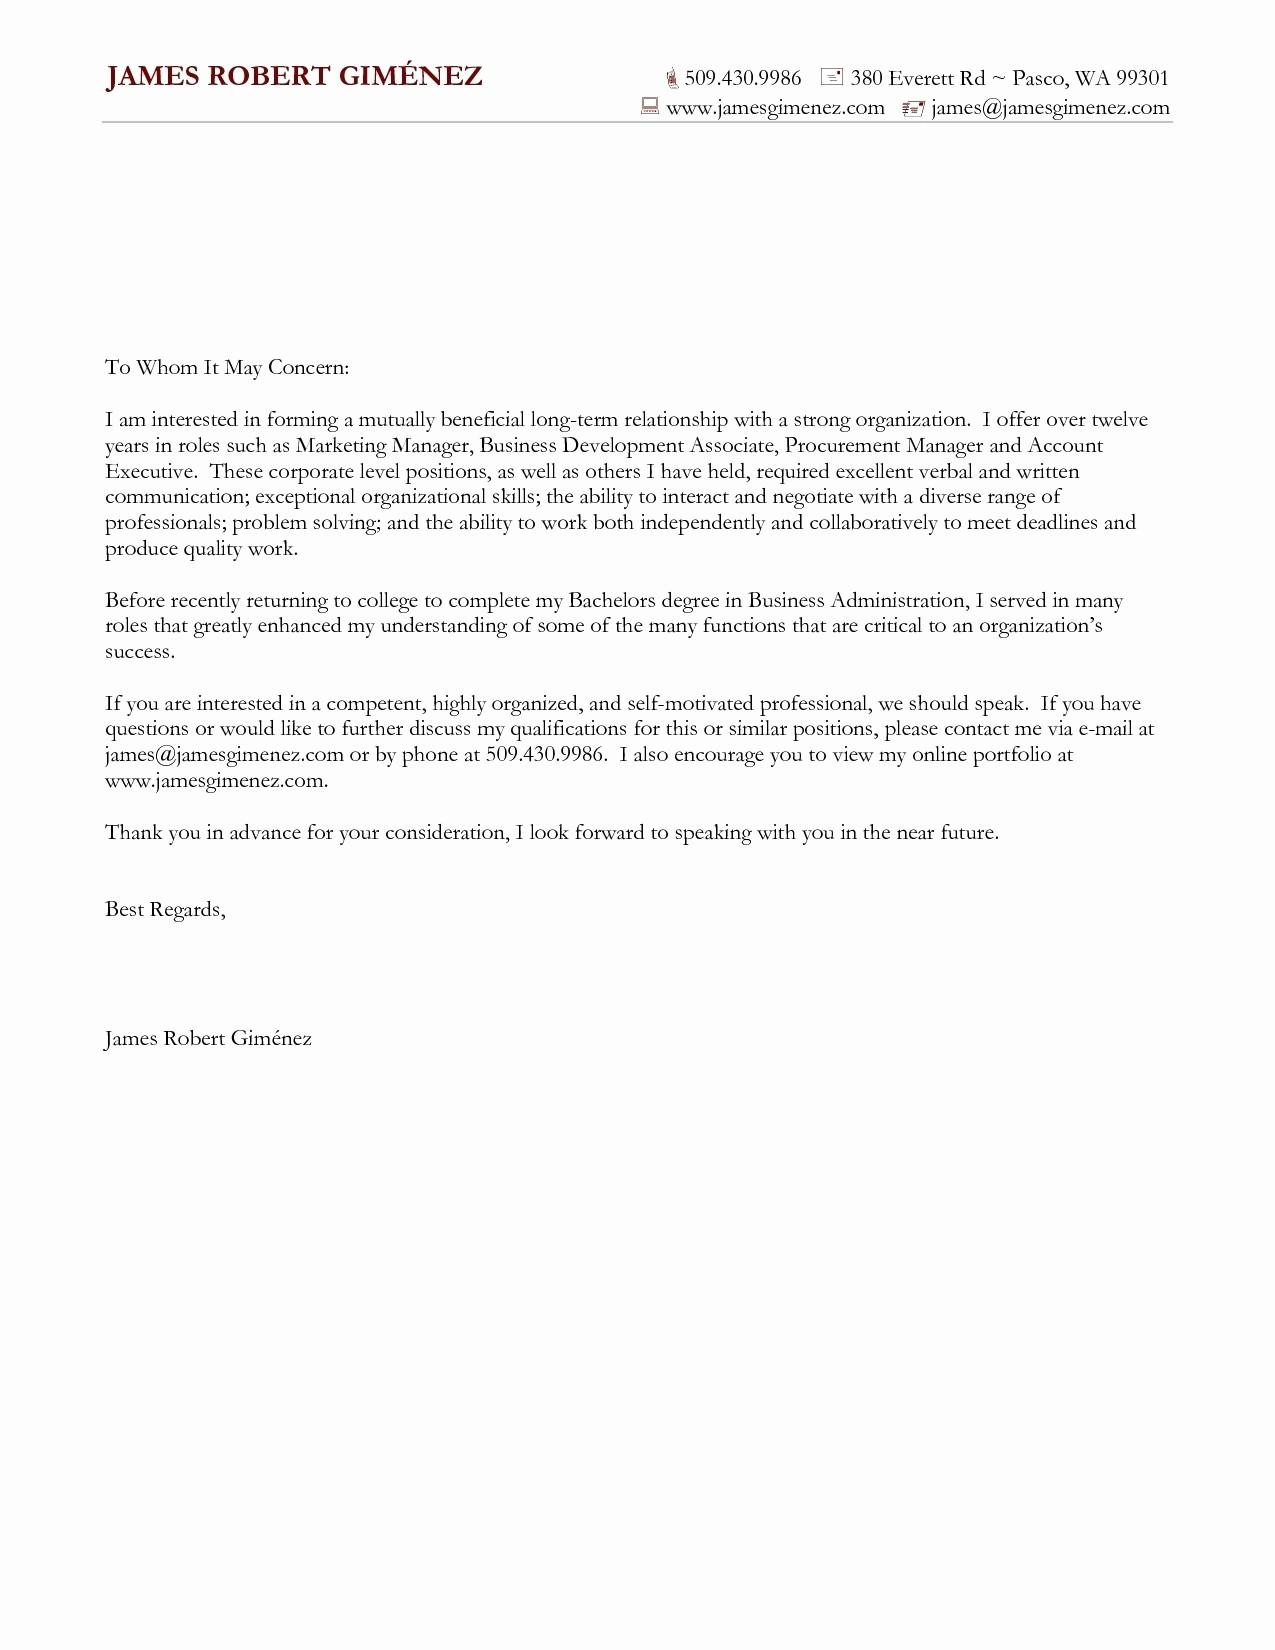 Simple Resume Cover Letter Samples Luxury Mock Cover Letter